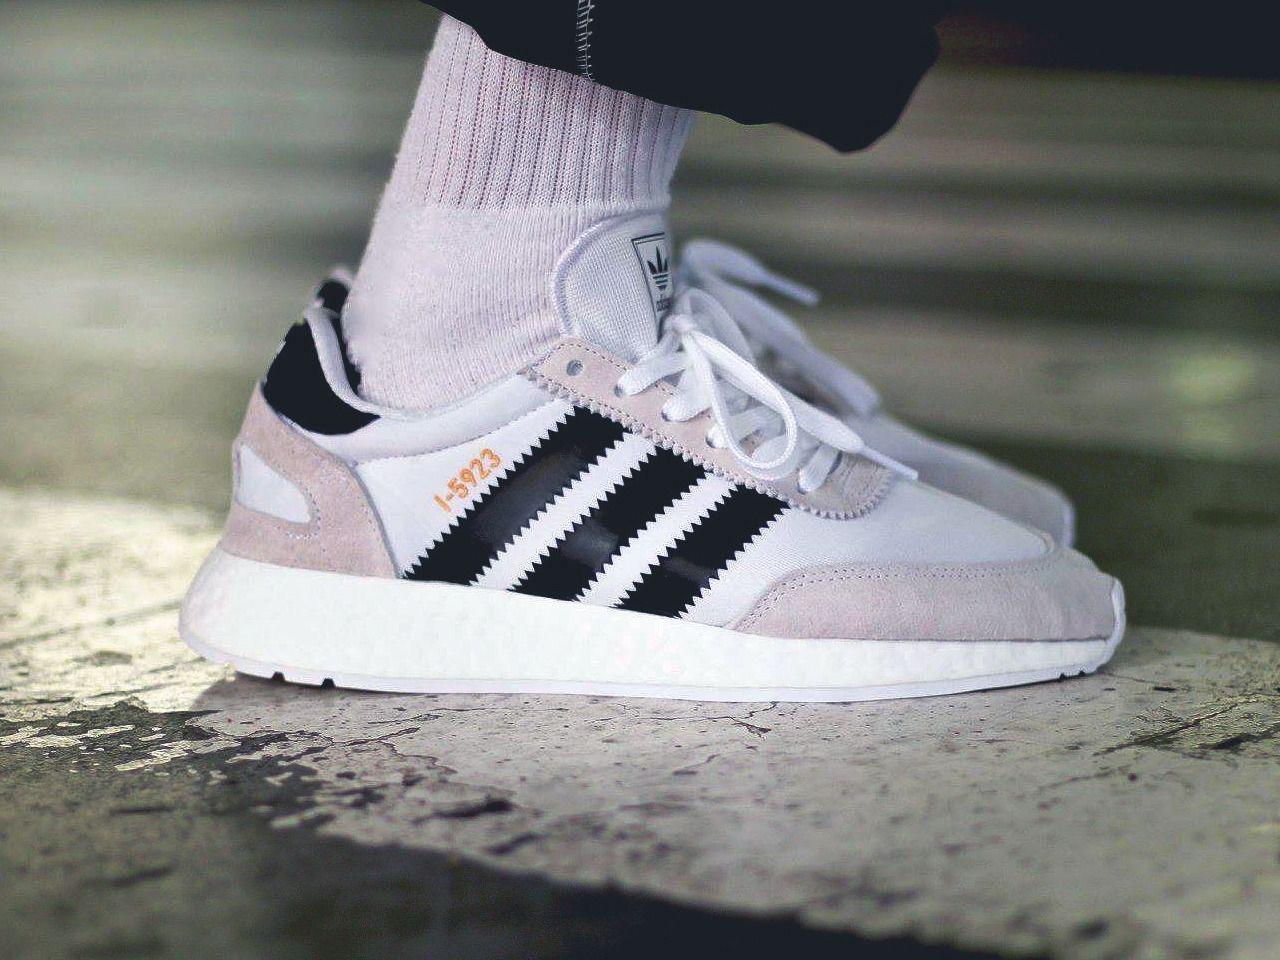 newest 964dd c1a05 Adidas I-5923 - WhiteBlackCopper - 2018 (by Cerje Jack-l)